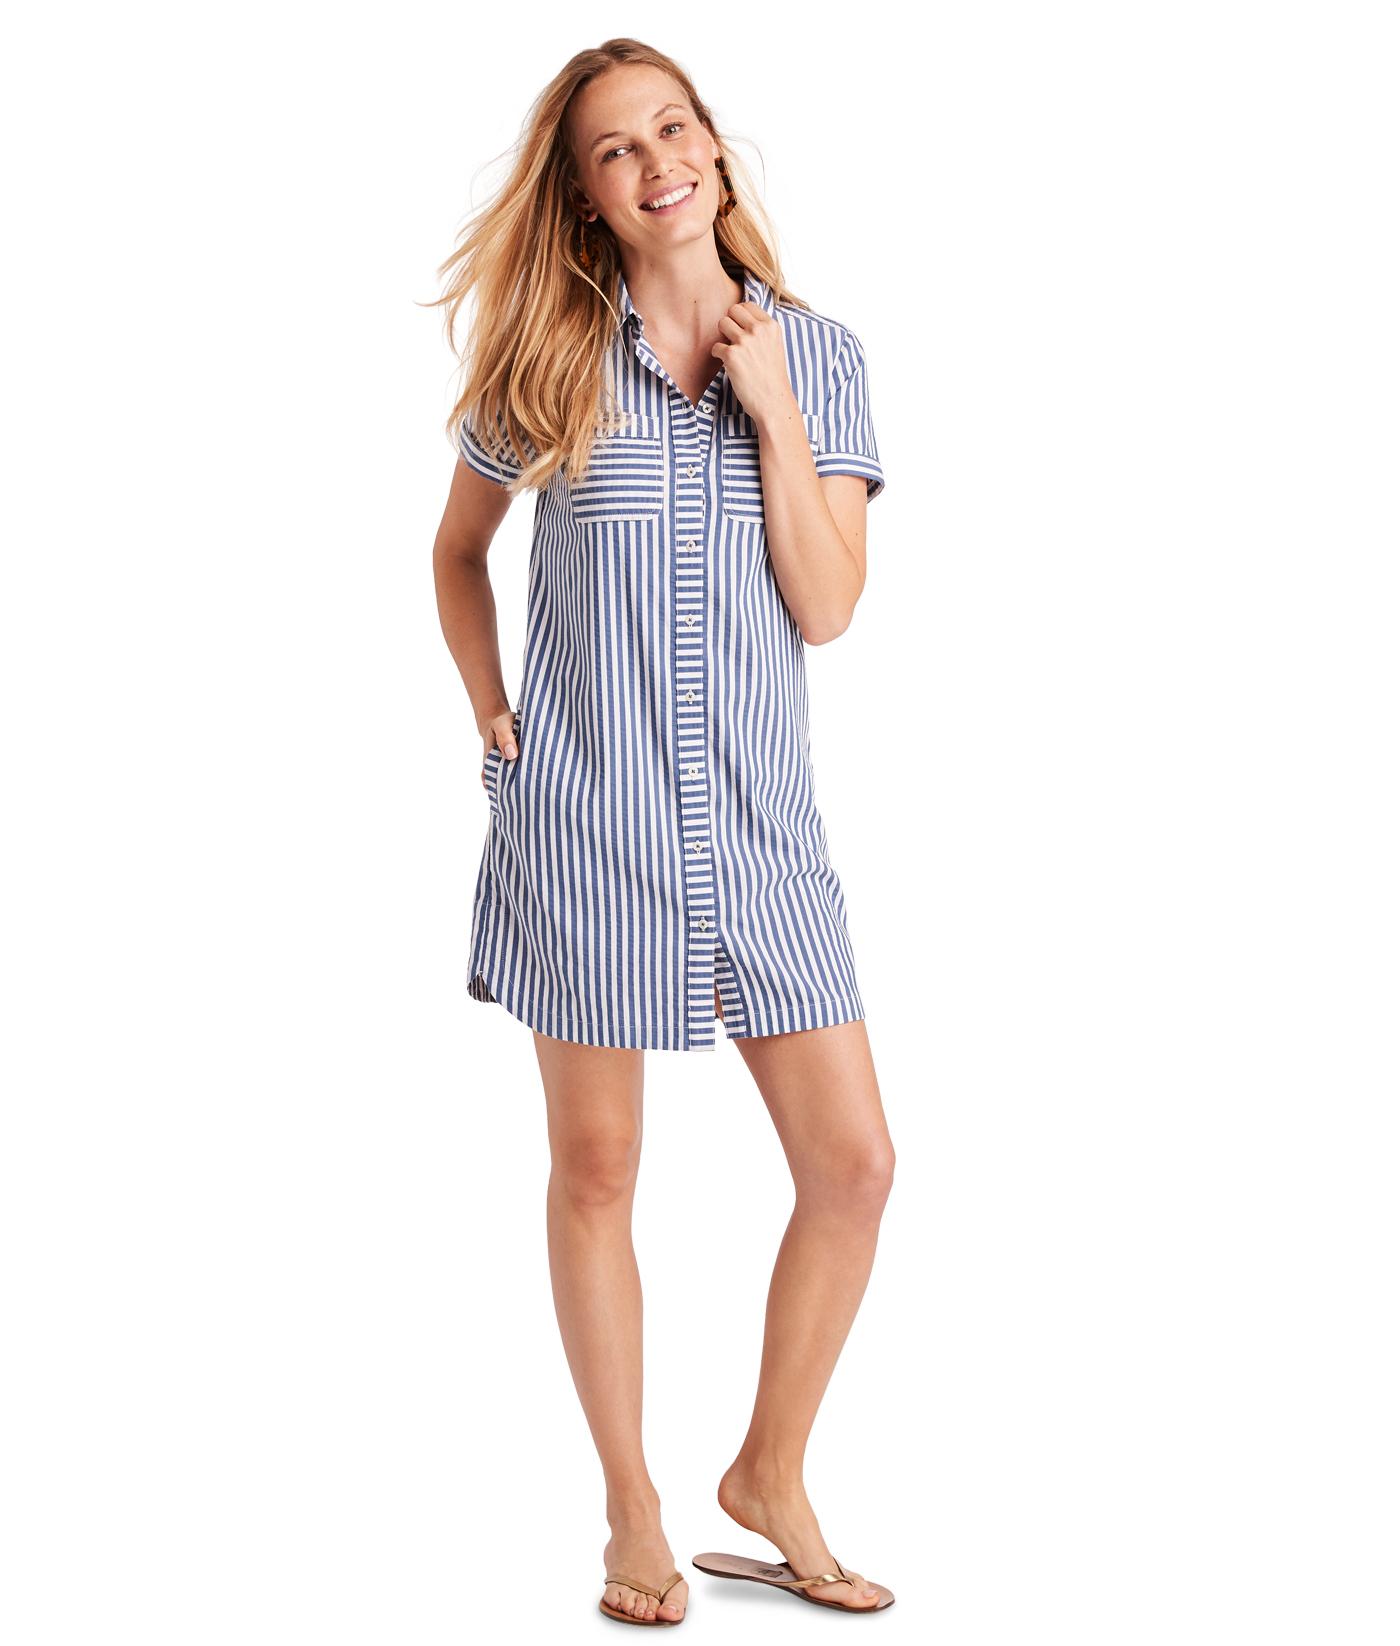 Shop Margo Shore Seersucker Shirt Dress At Vineyard Vines